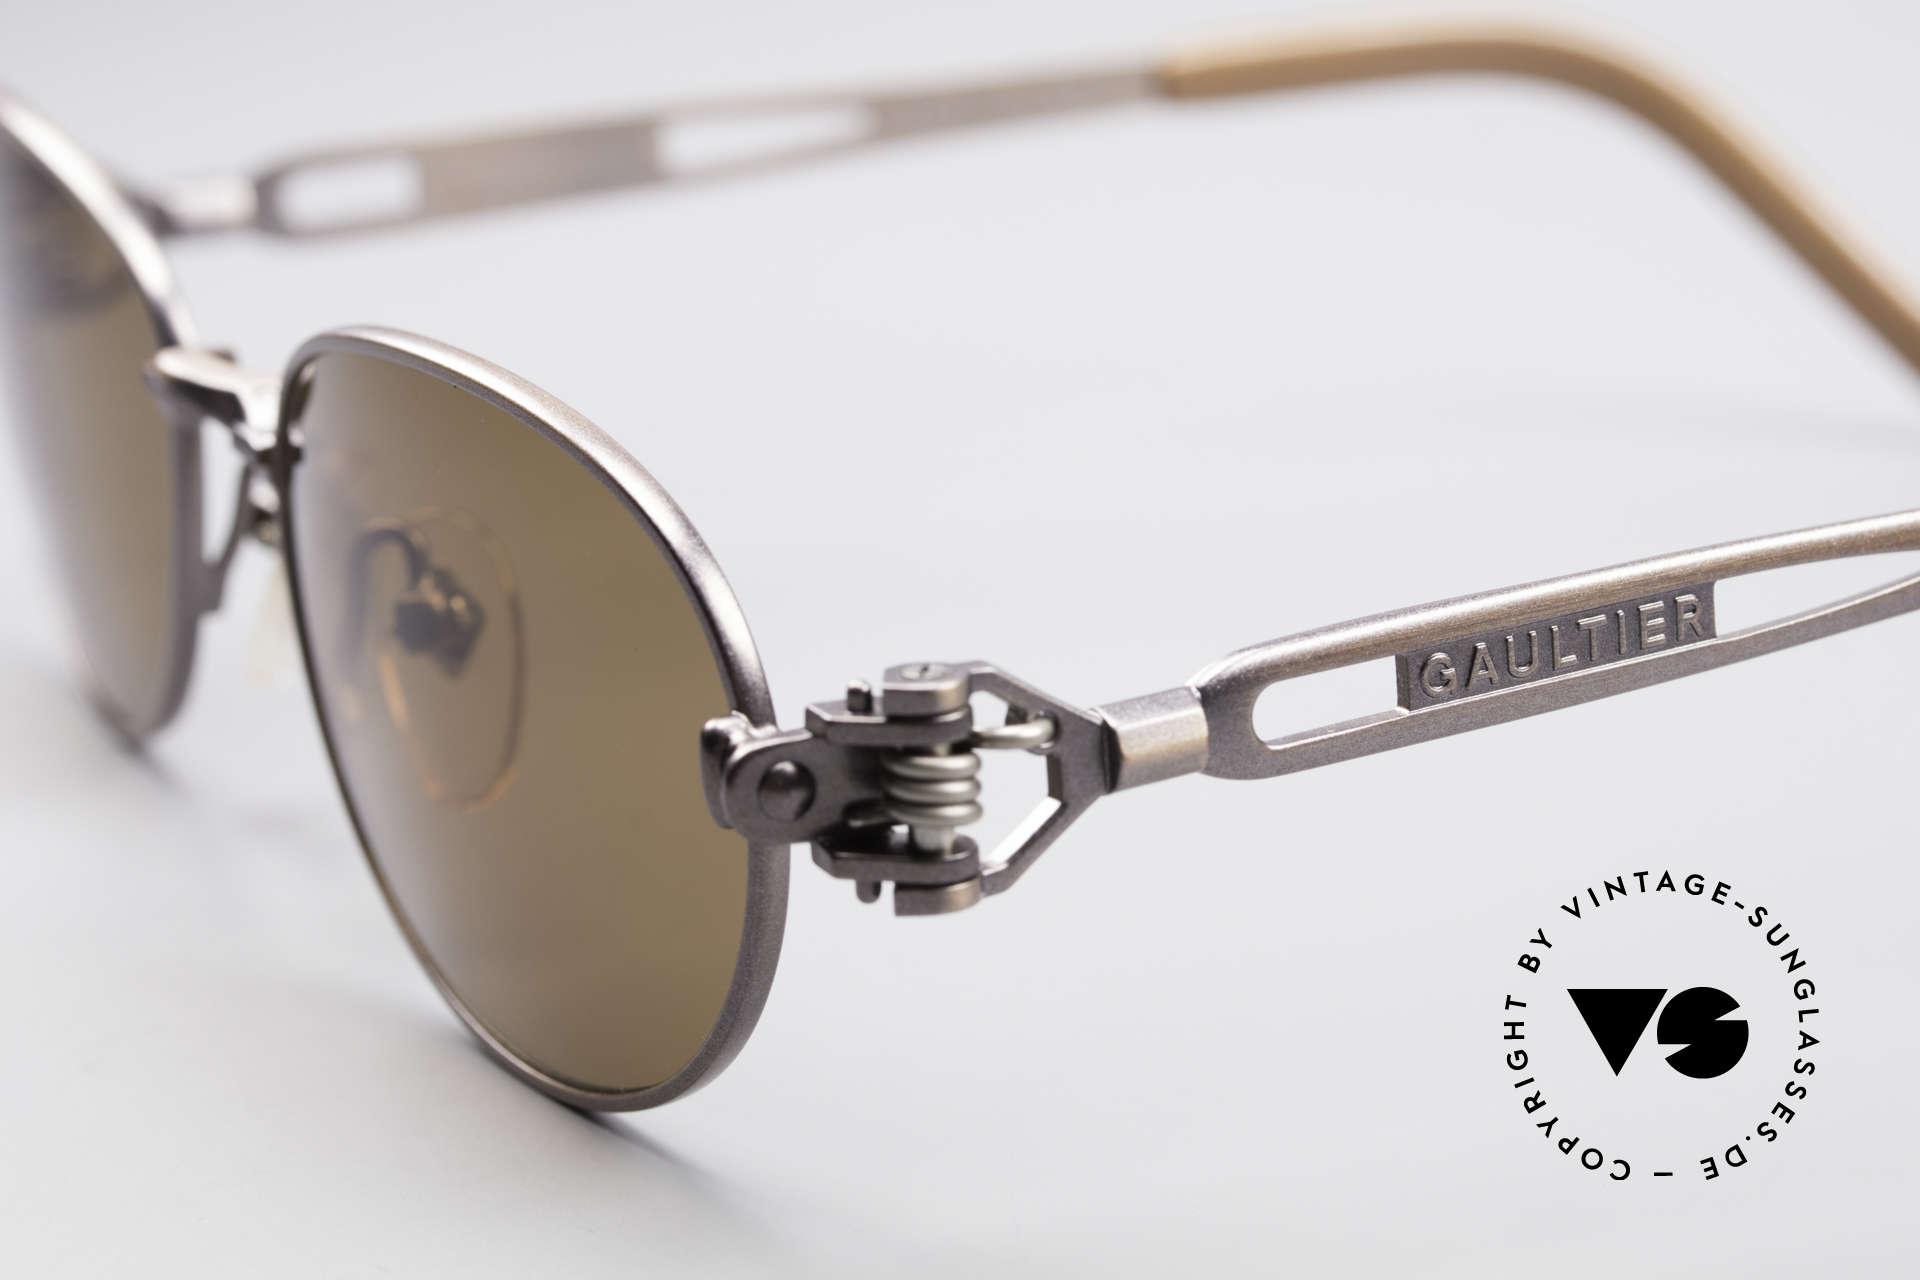 Jean Paul Gaultier 56-8102 Oval Steampunk Sunglasses, never worn (like all our JPG Steampunk sunglasses), Made for Men and Women